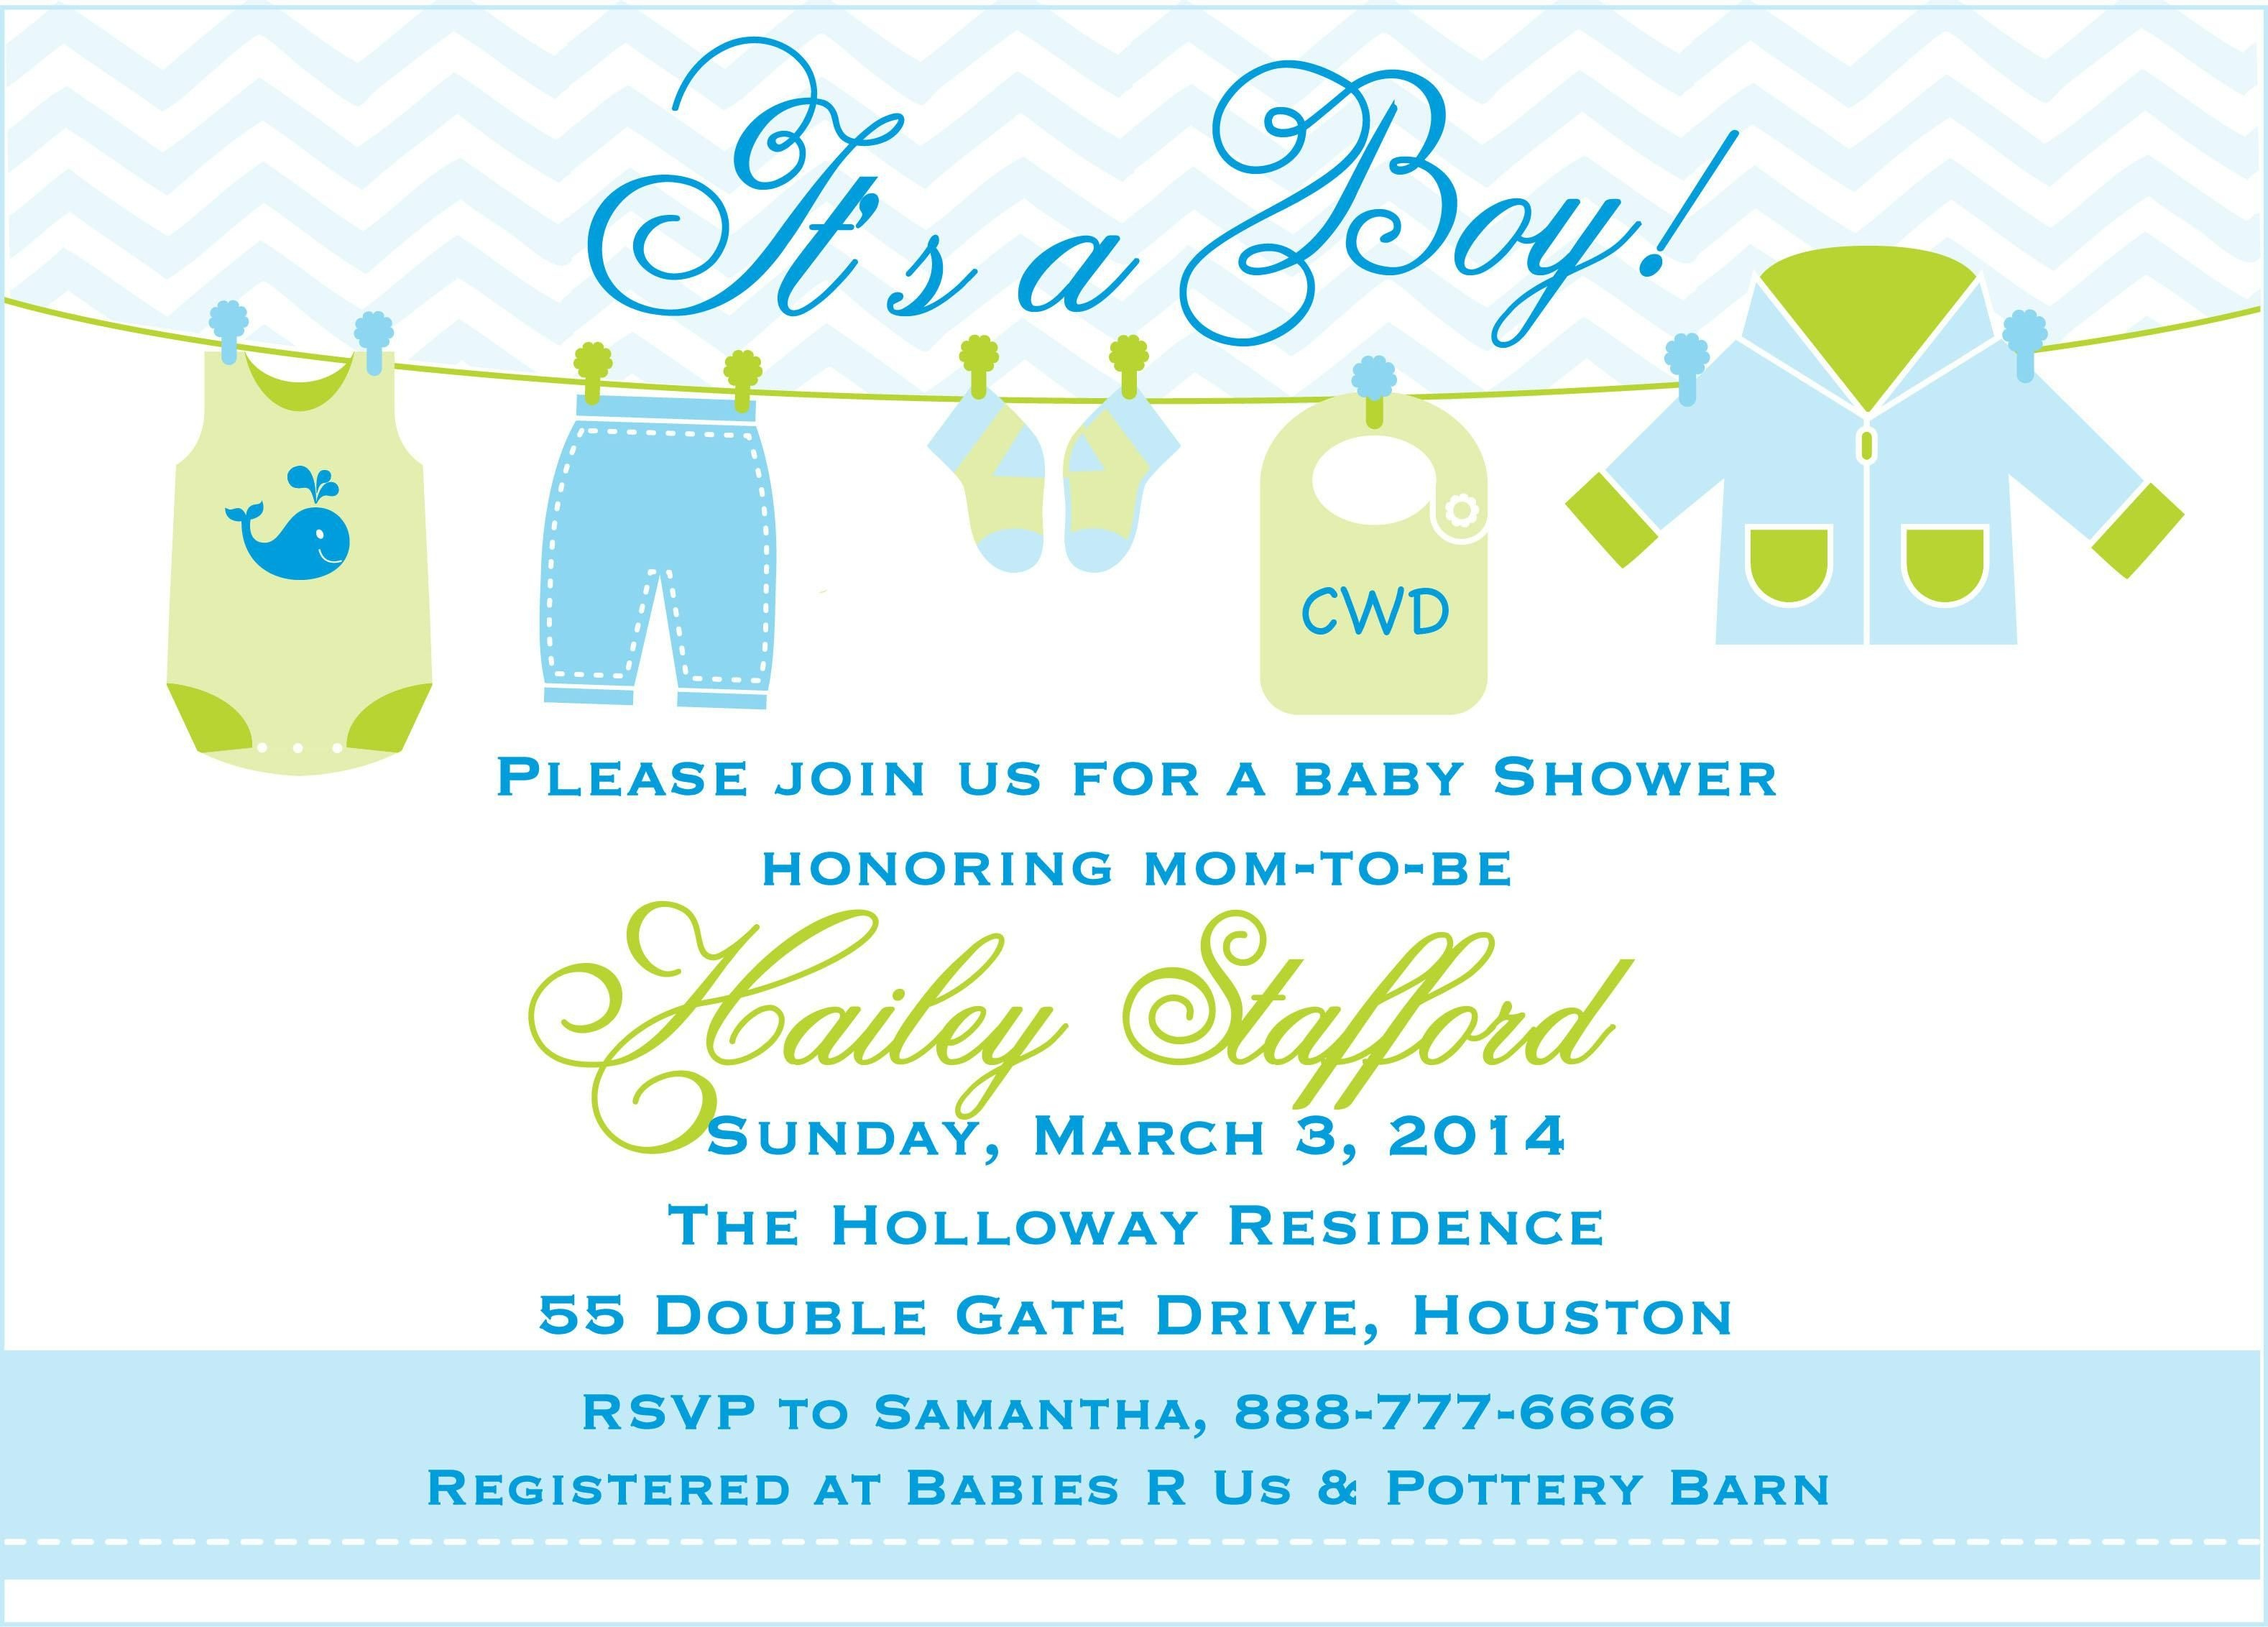 Baby Boy Shower Invitations Templates Free | Baby Shower In 2019 - Free Baby Boy Shower Invitations Printable